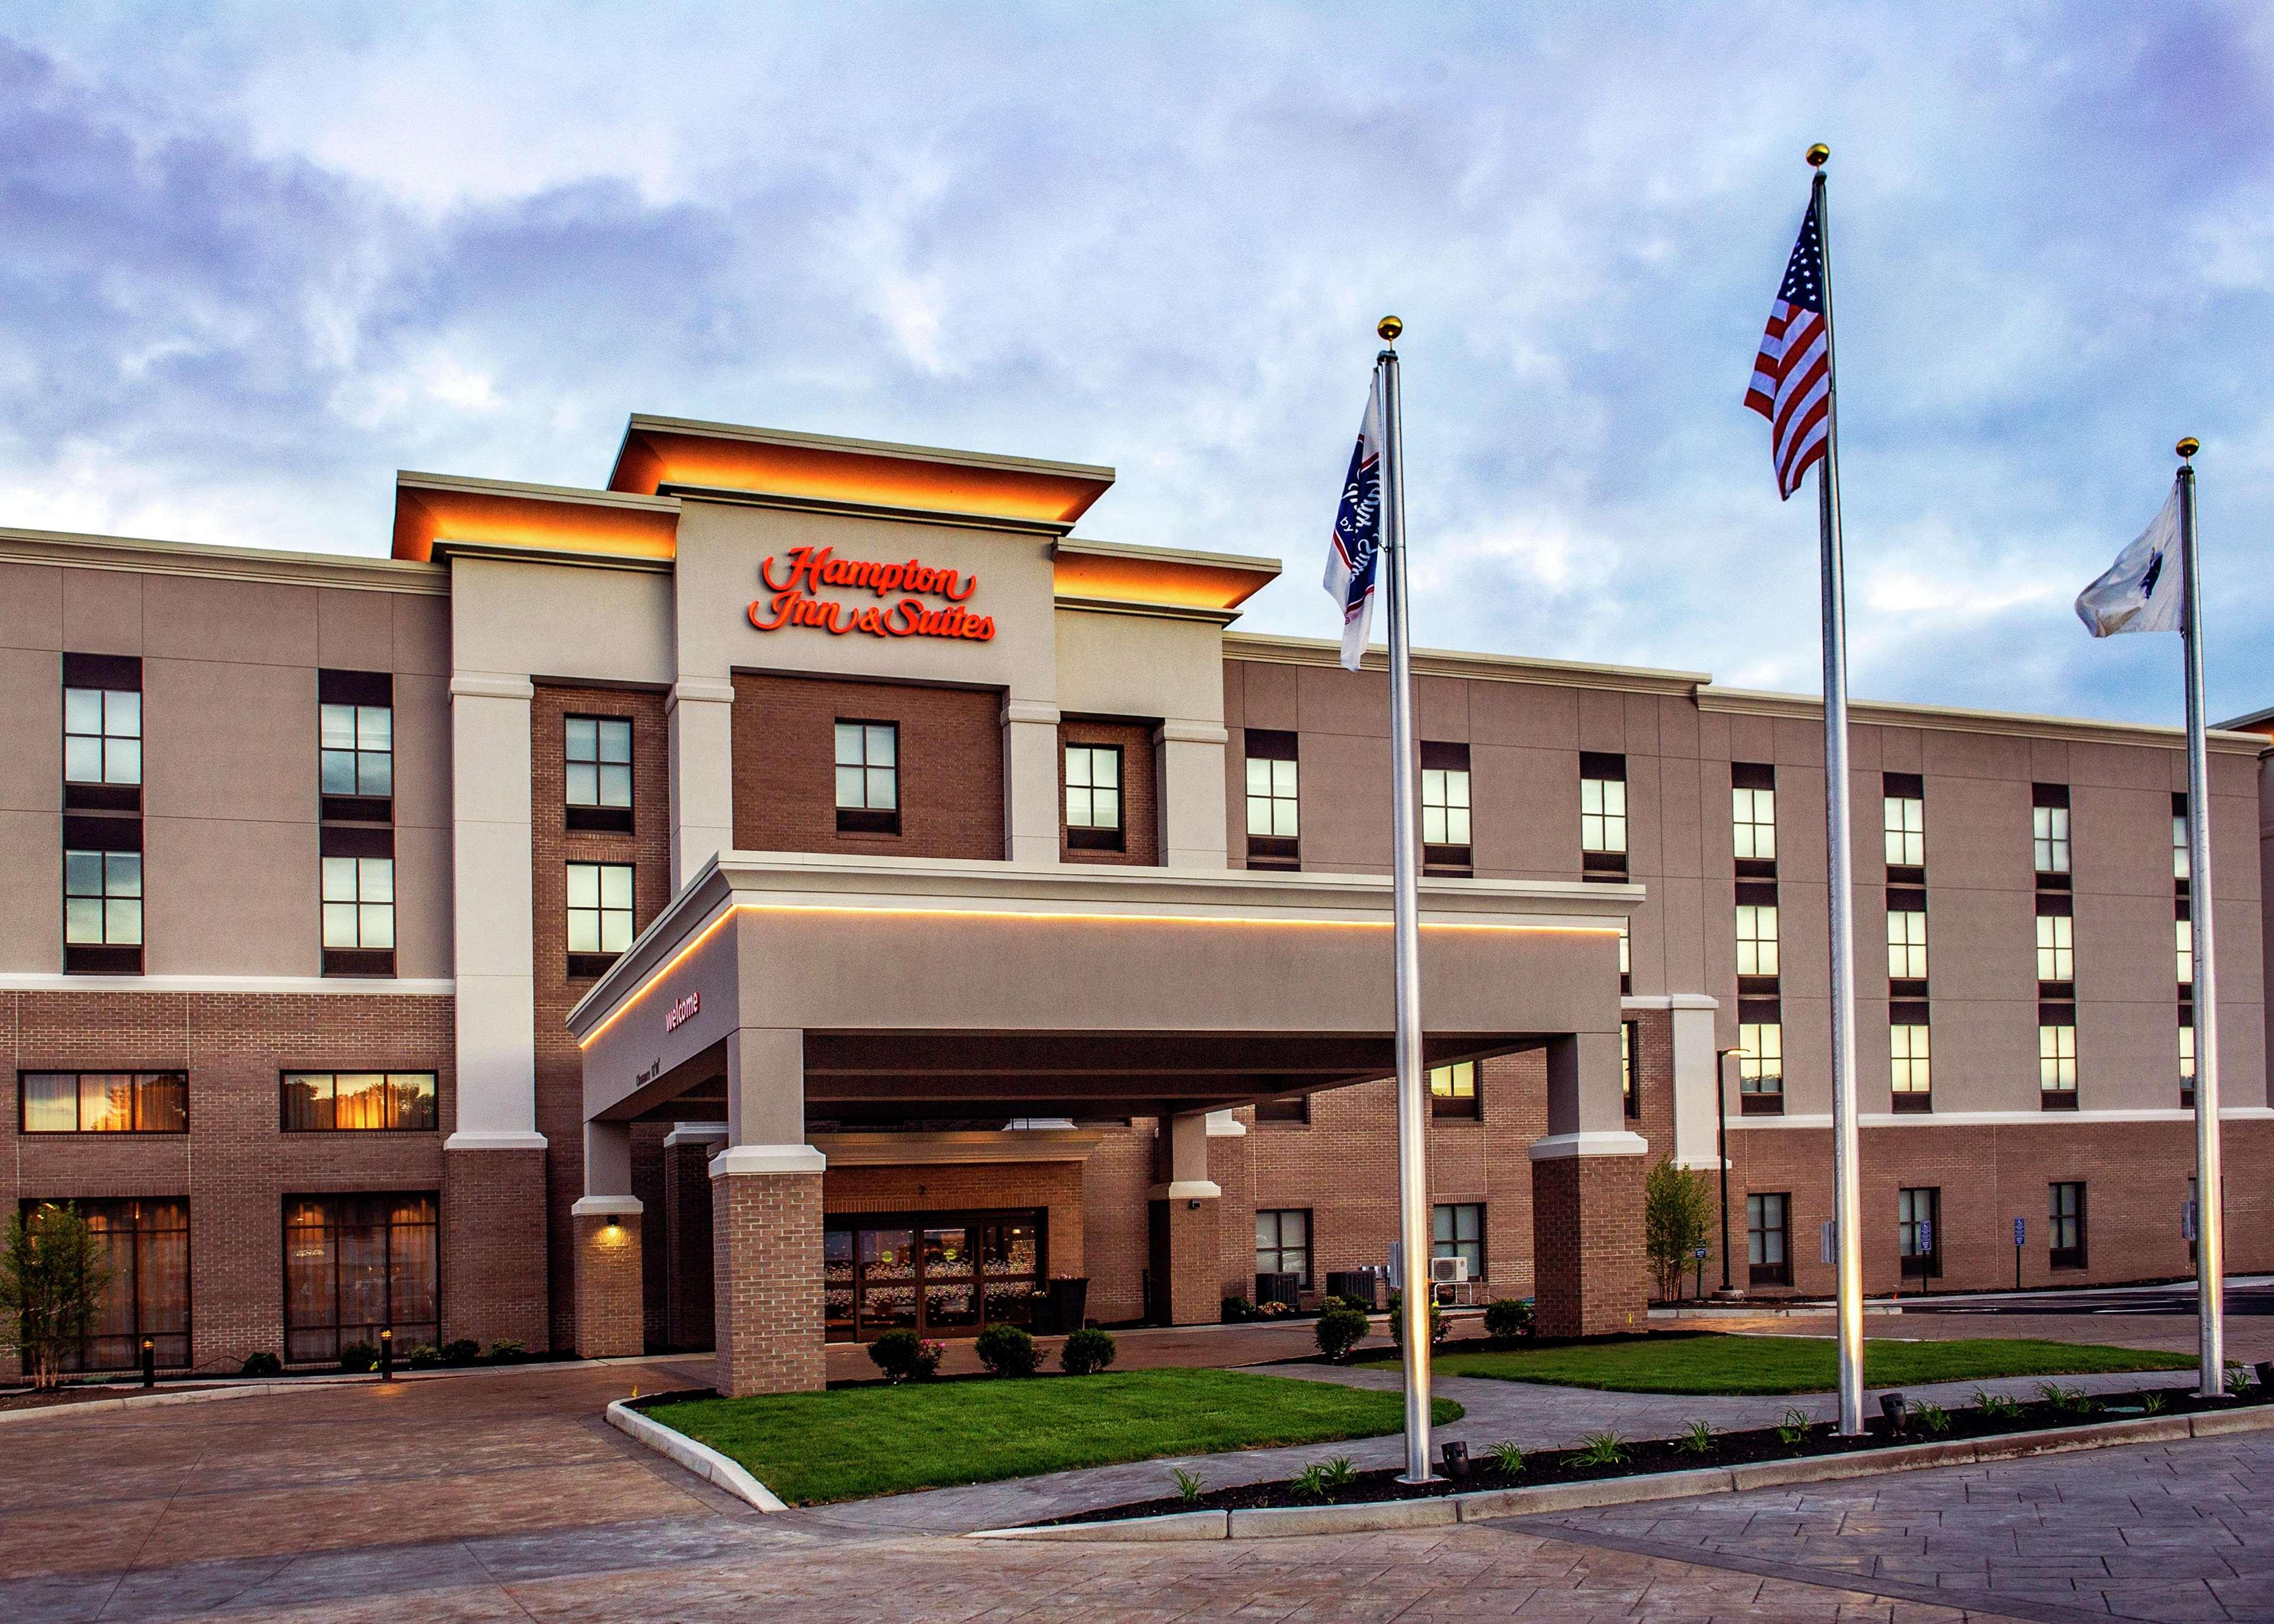 Hampton Inn & Suites Foxborough - Mansfield, MA, Norfolk